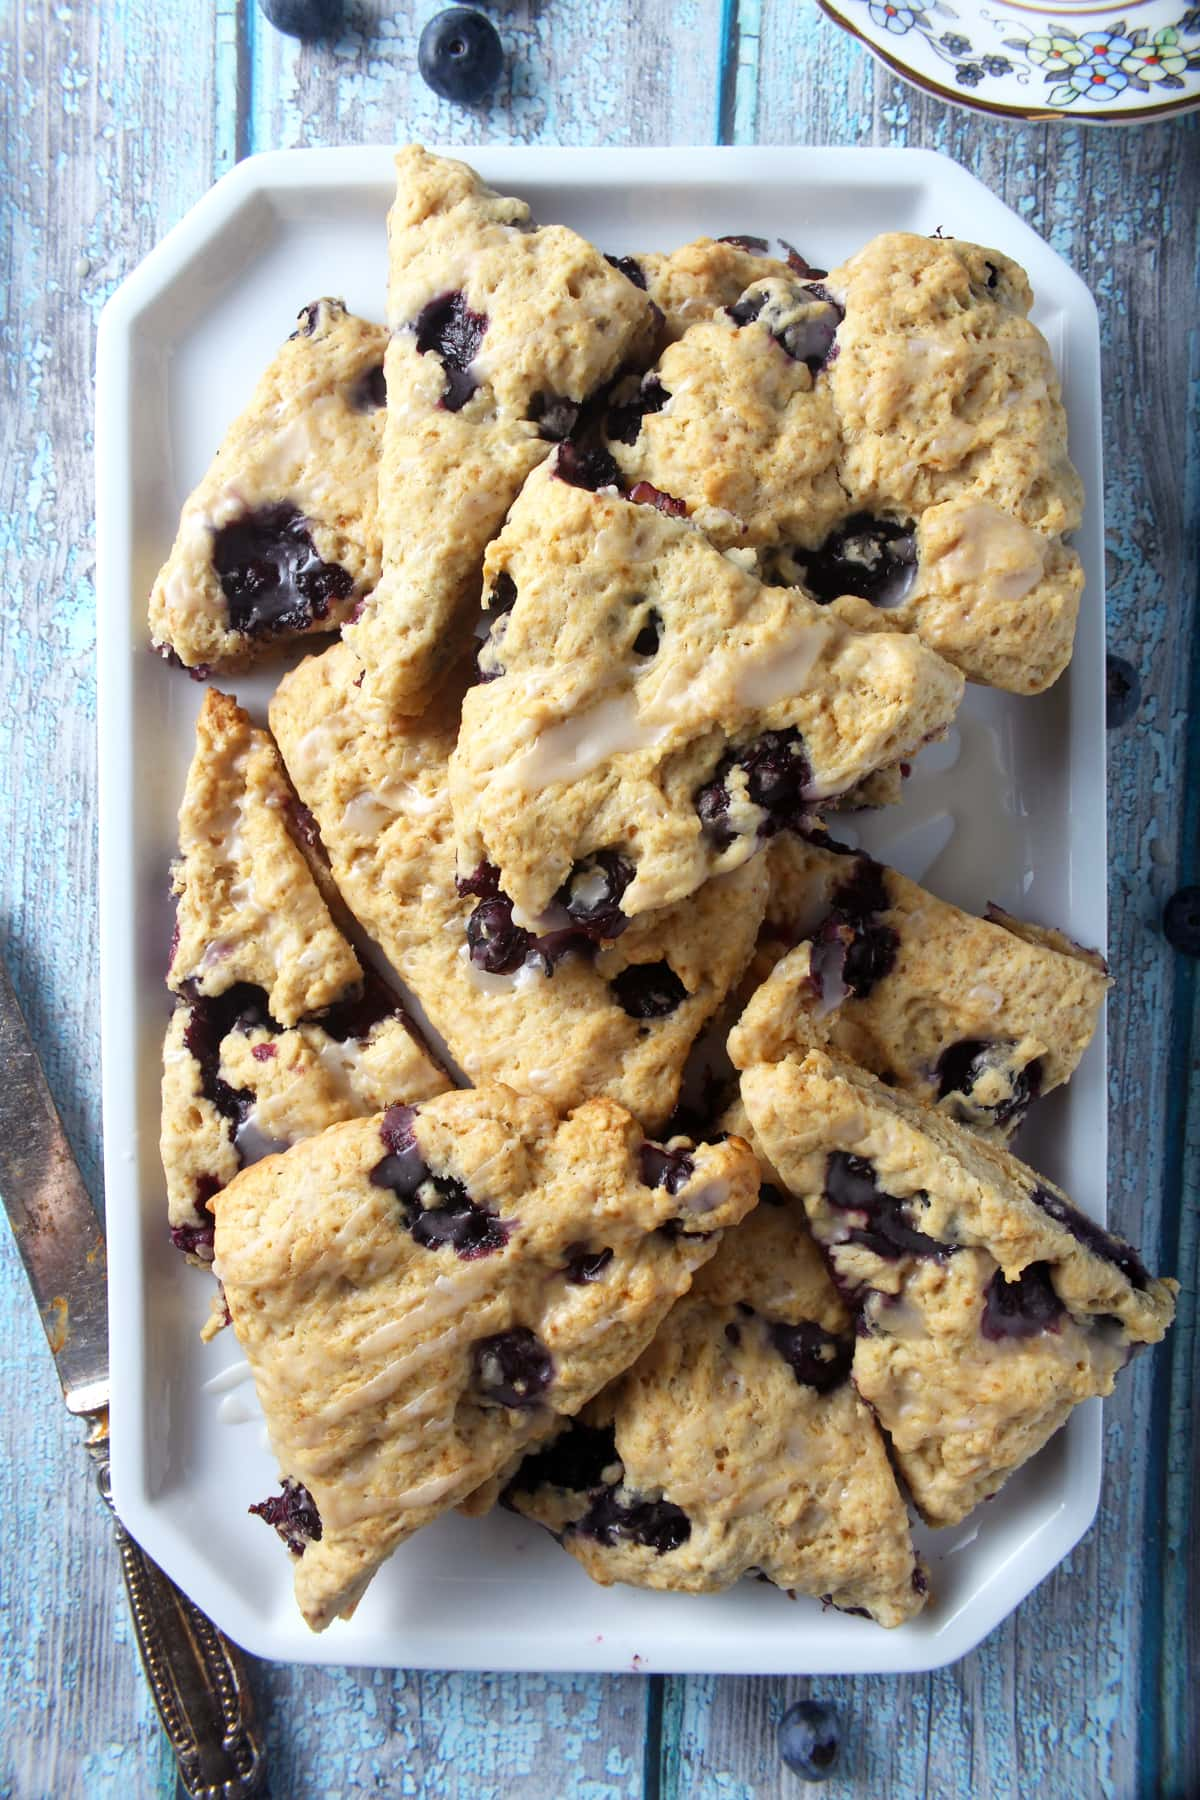 tray full of vegan blueberry scones